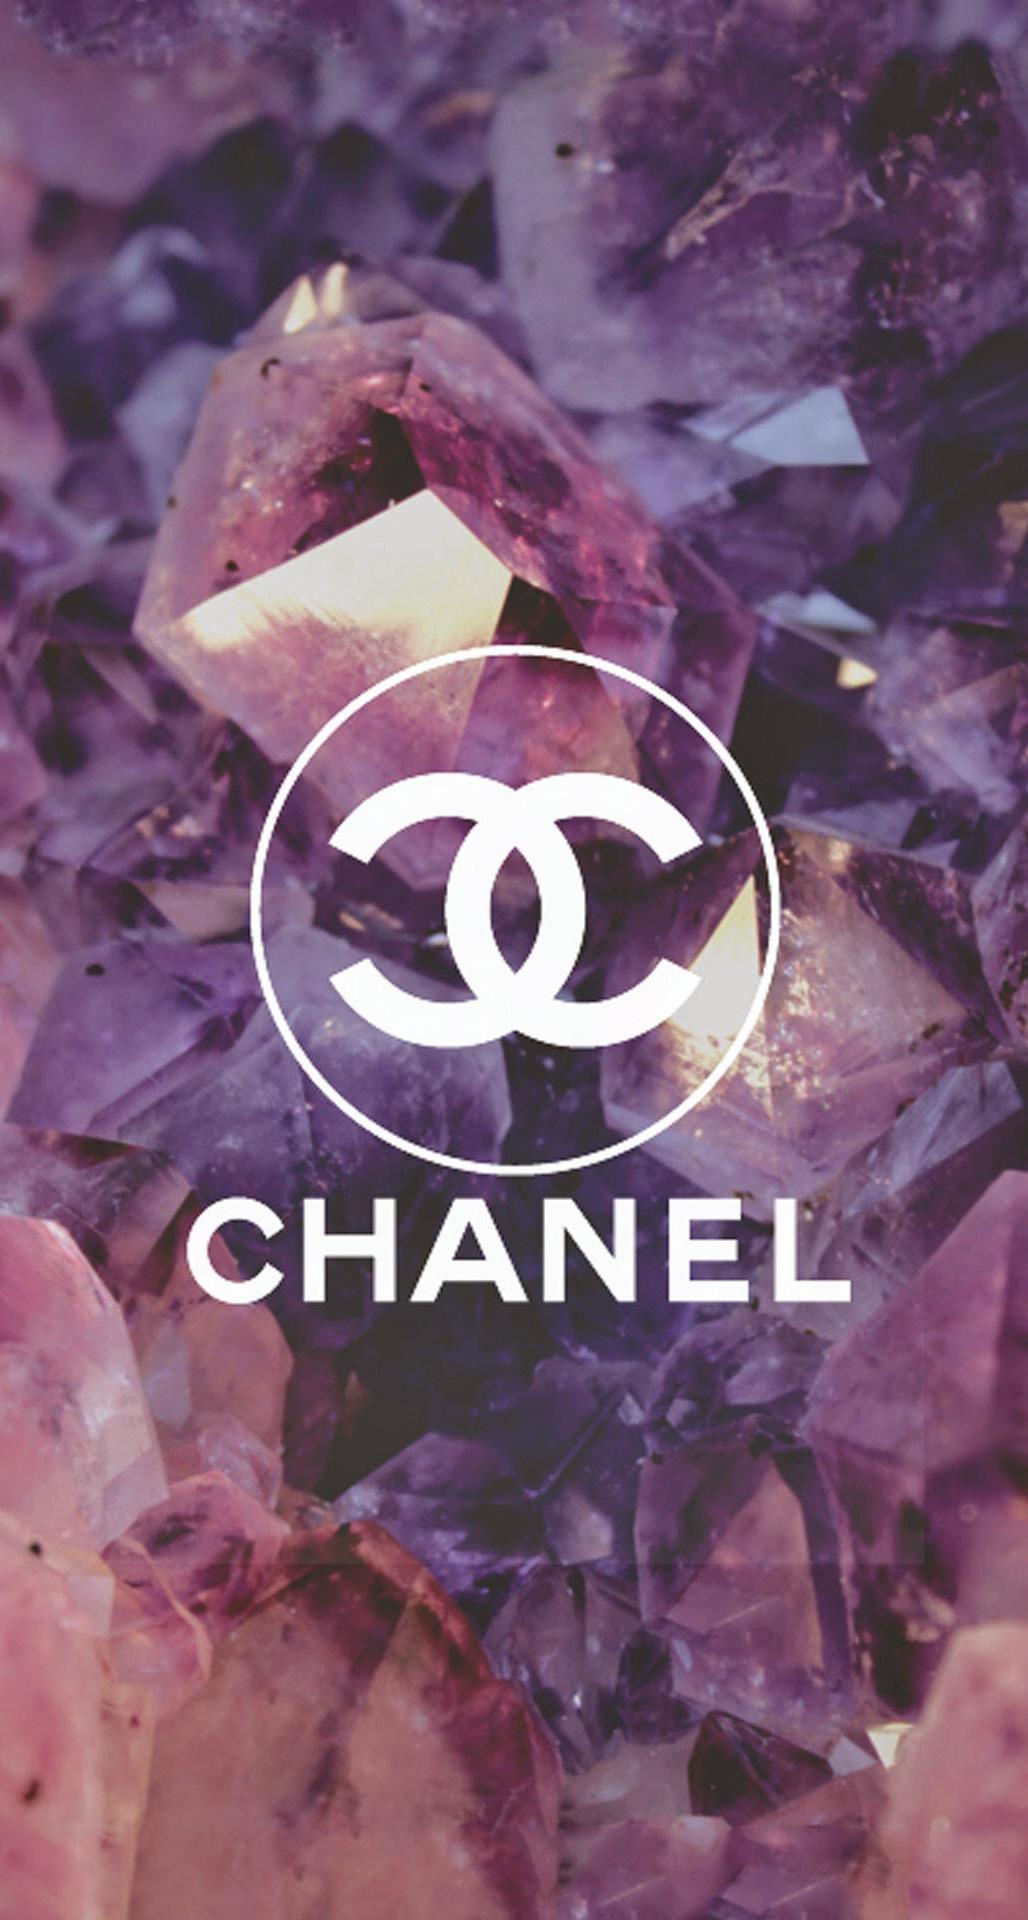 Coco-Chanel-Logo-Diamonds-iPhone-Plus-HD-wallpaper-wp5006153